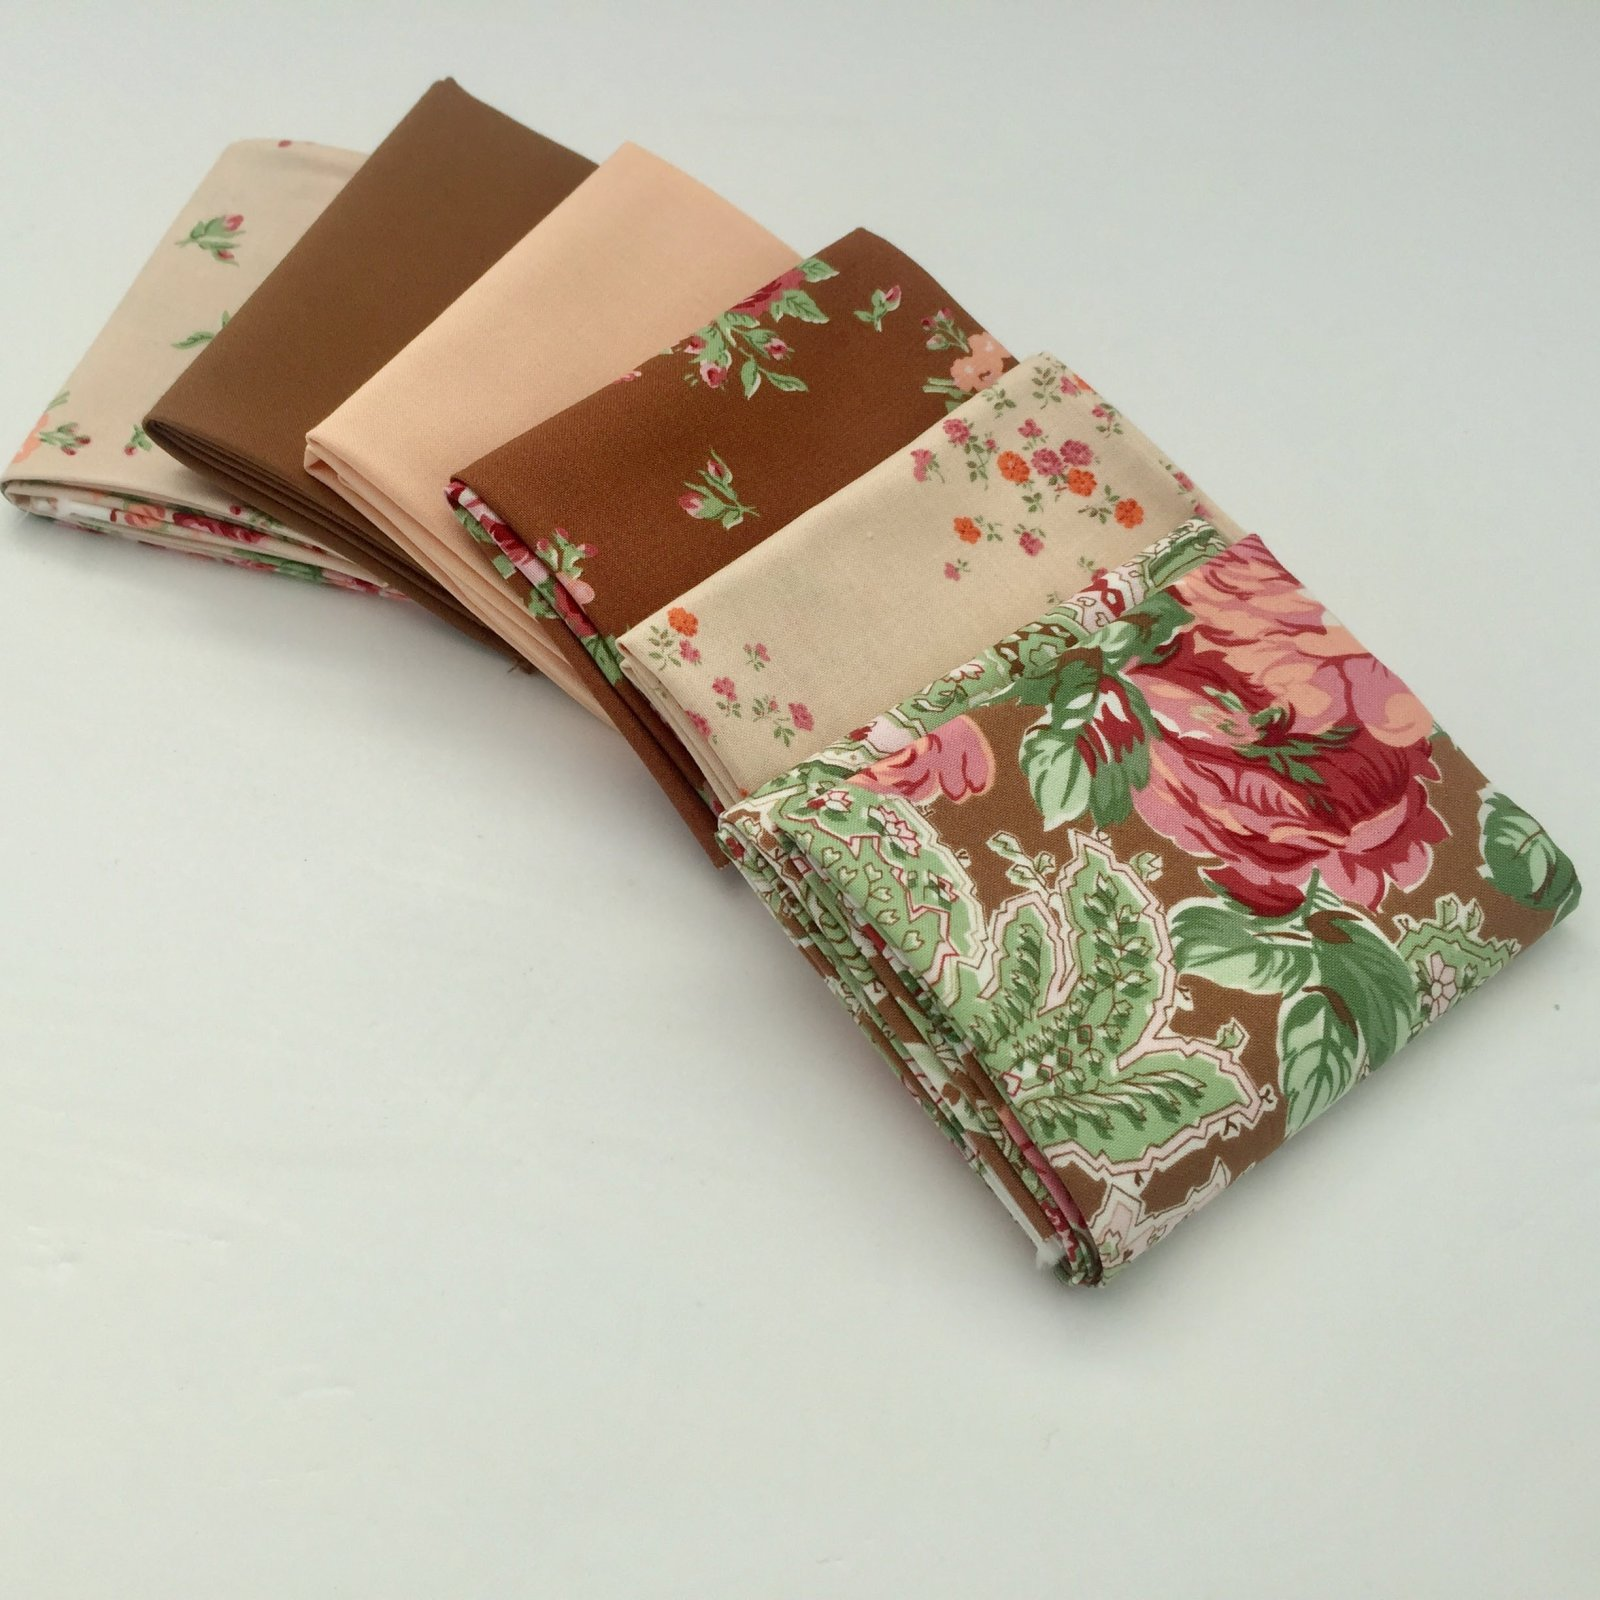 Cindy-rella's Assorted 6FQ Bundle - Vera Rose